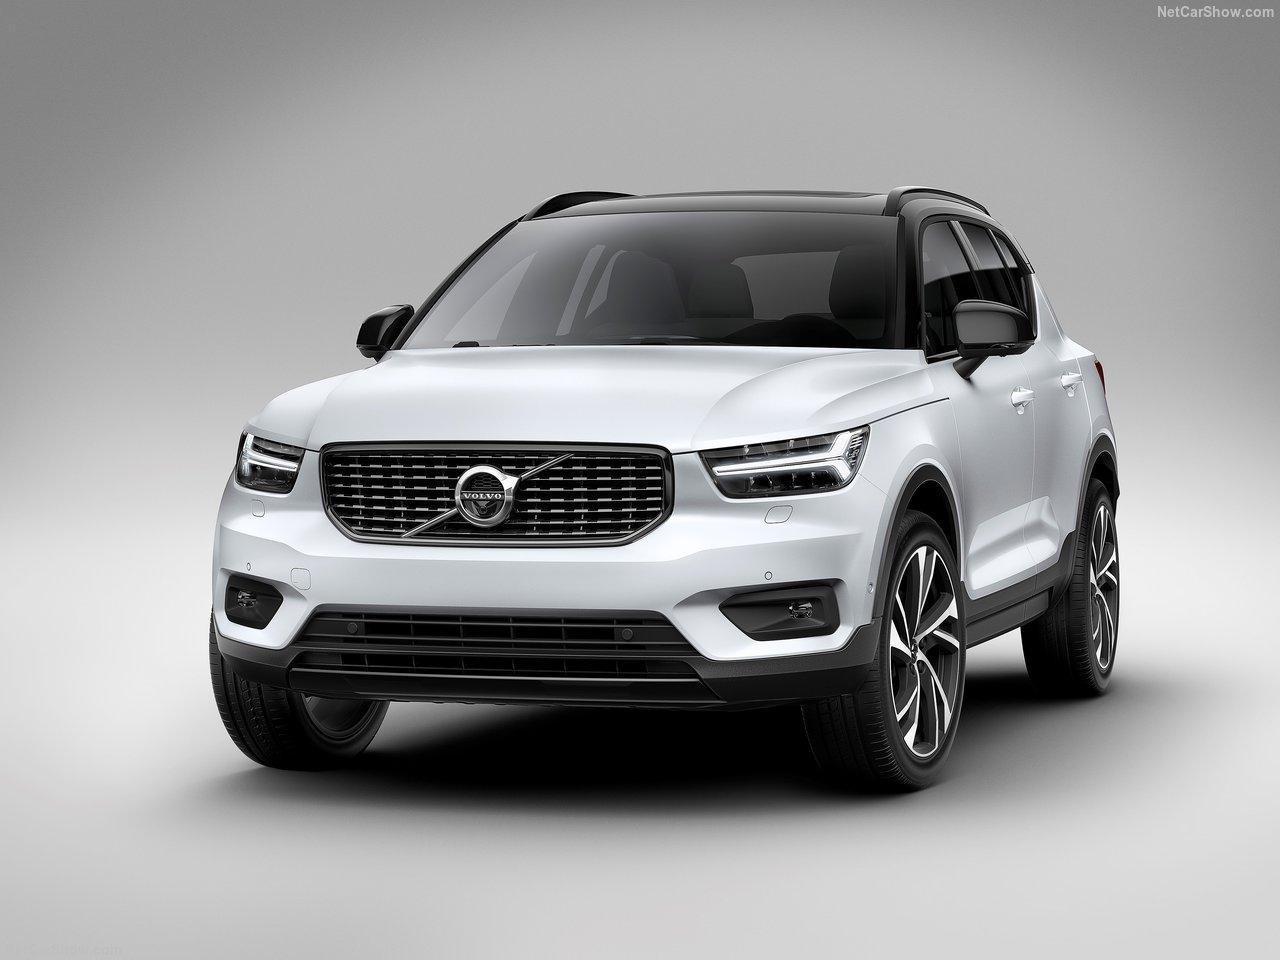 Volvo-XC40-2018-1280-55.jpg